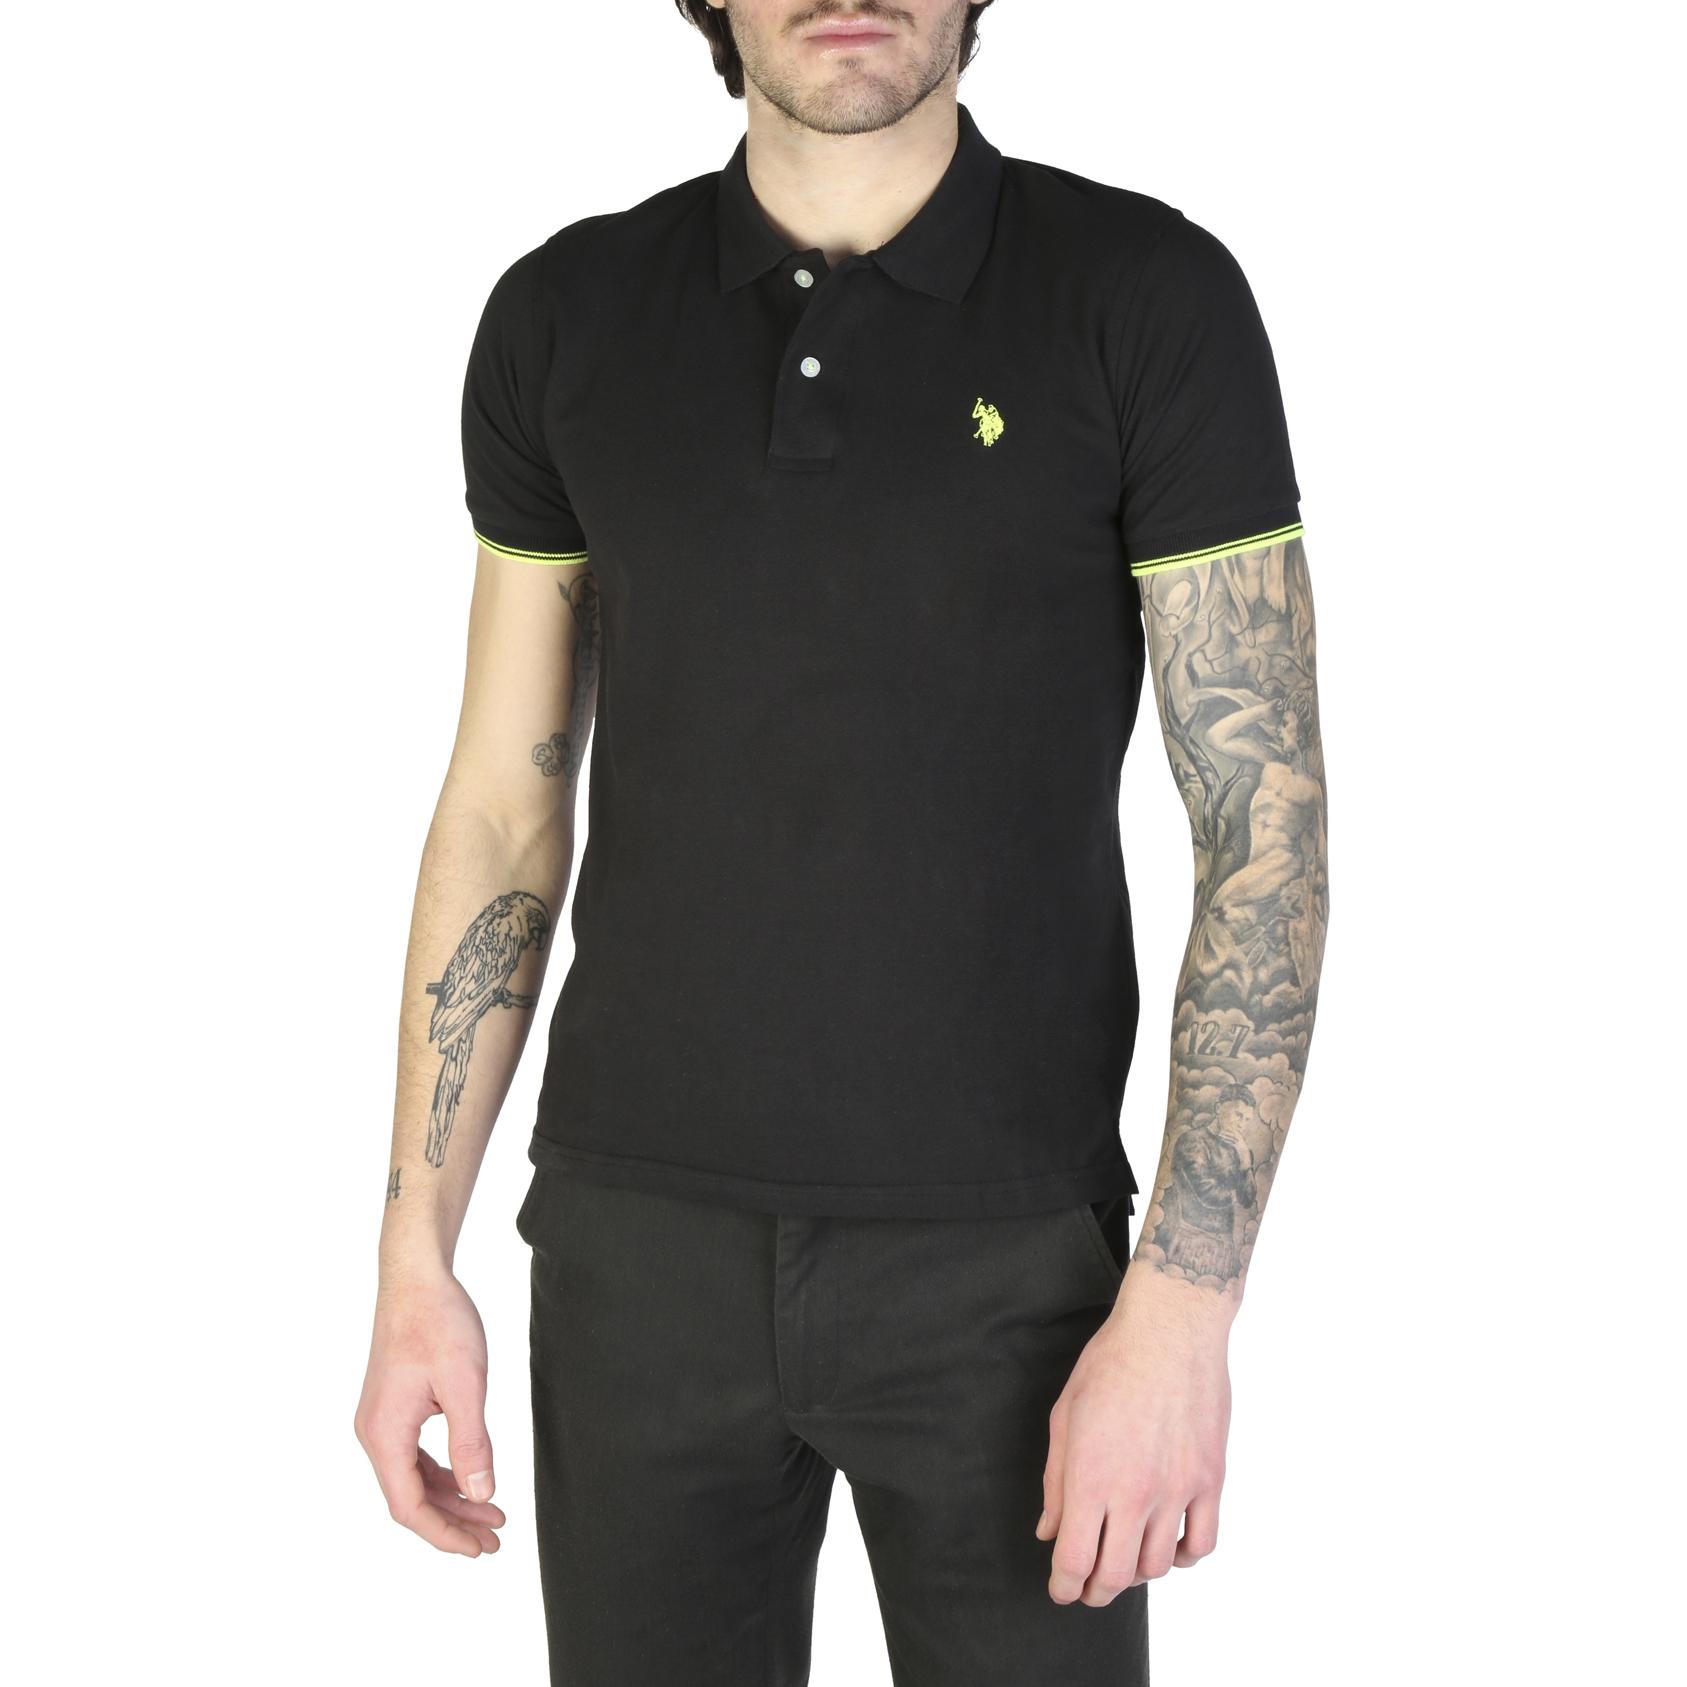 Chemises manches courtes  U.S. Polo 52432_41029 black